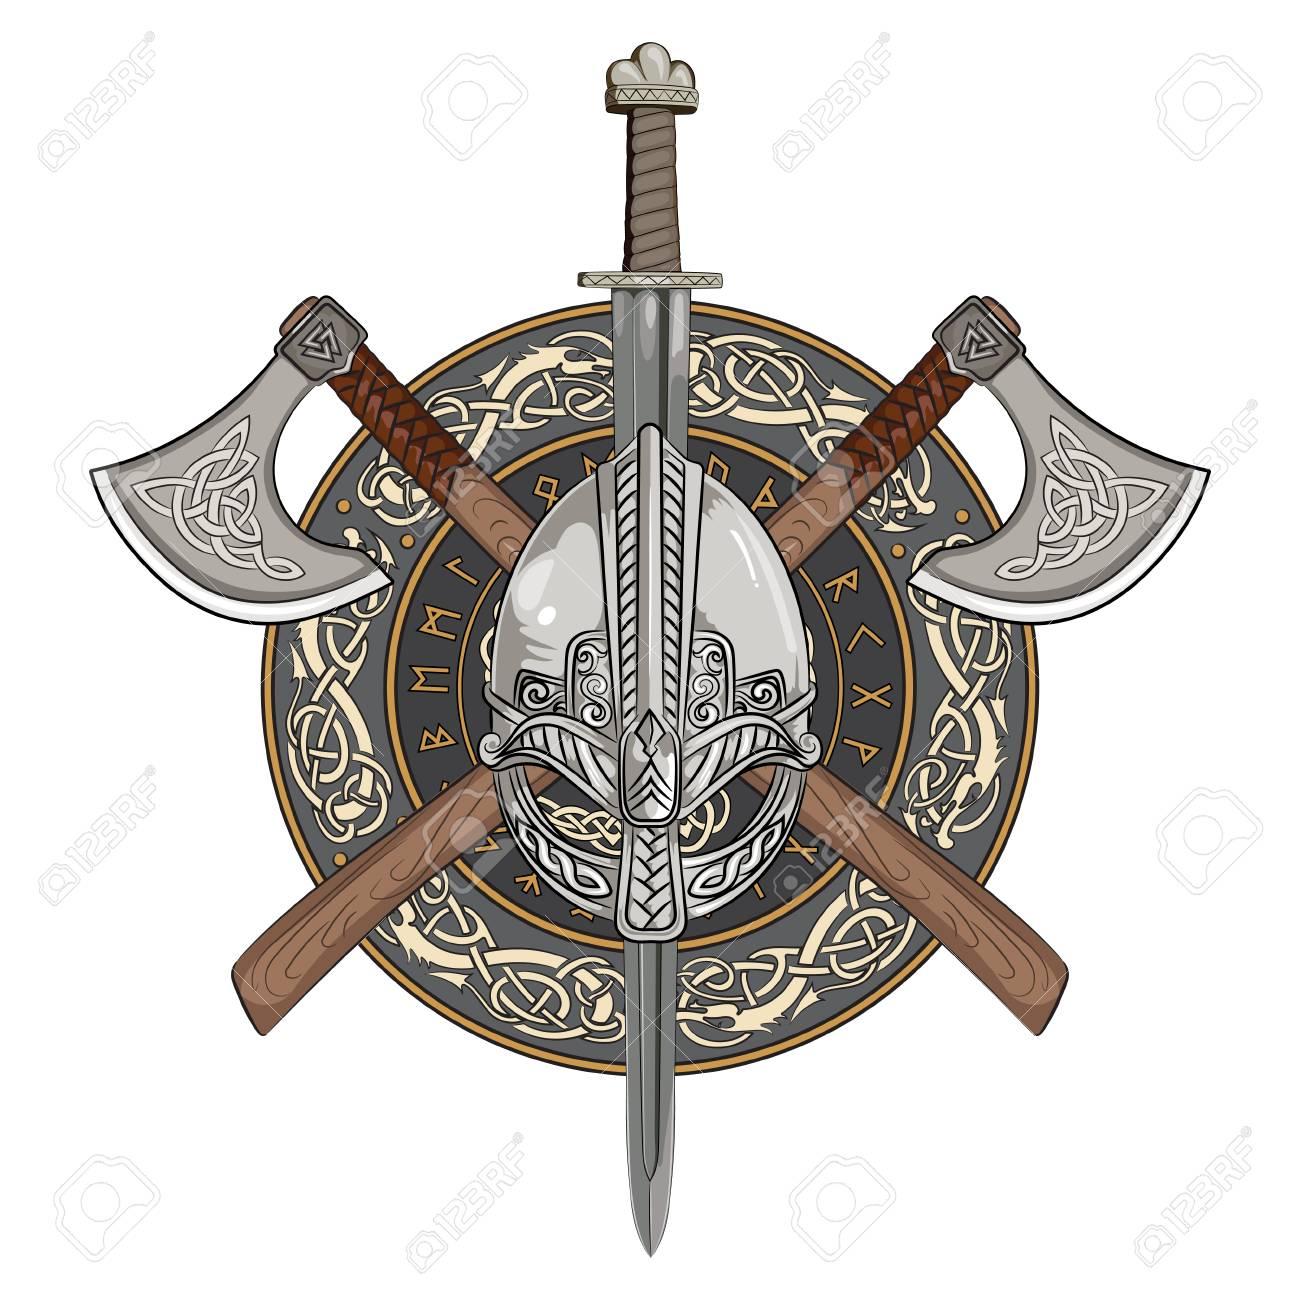 Viking Helmet Crossed Axes And In A Wreath Of Scandinavian